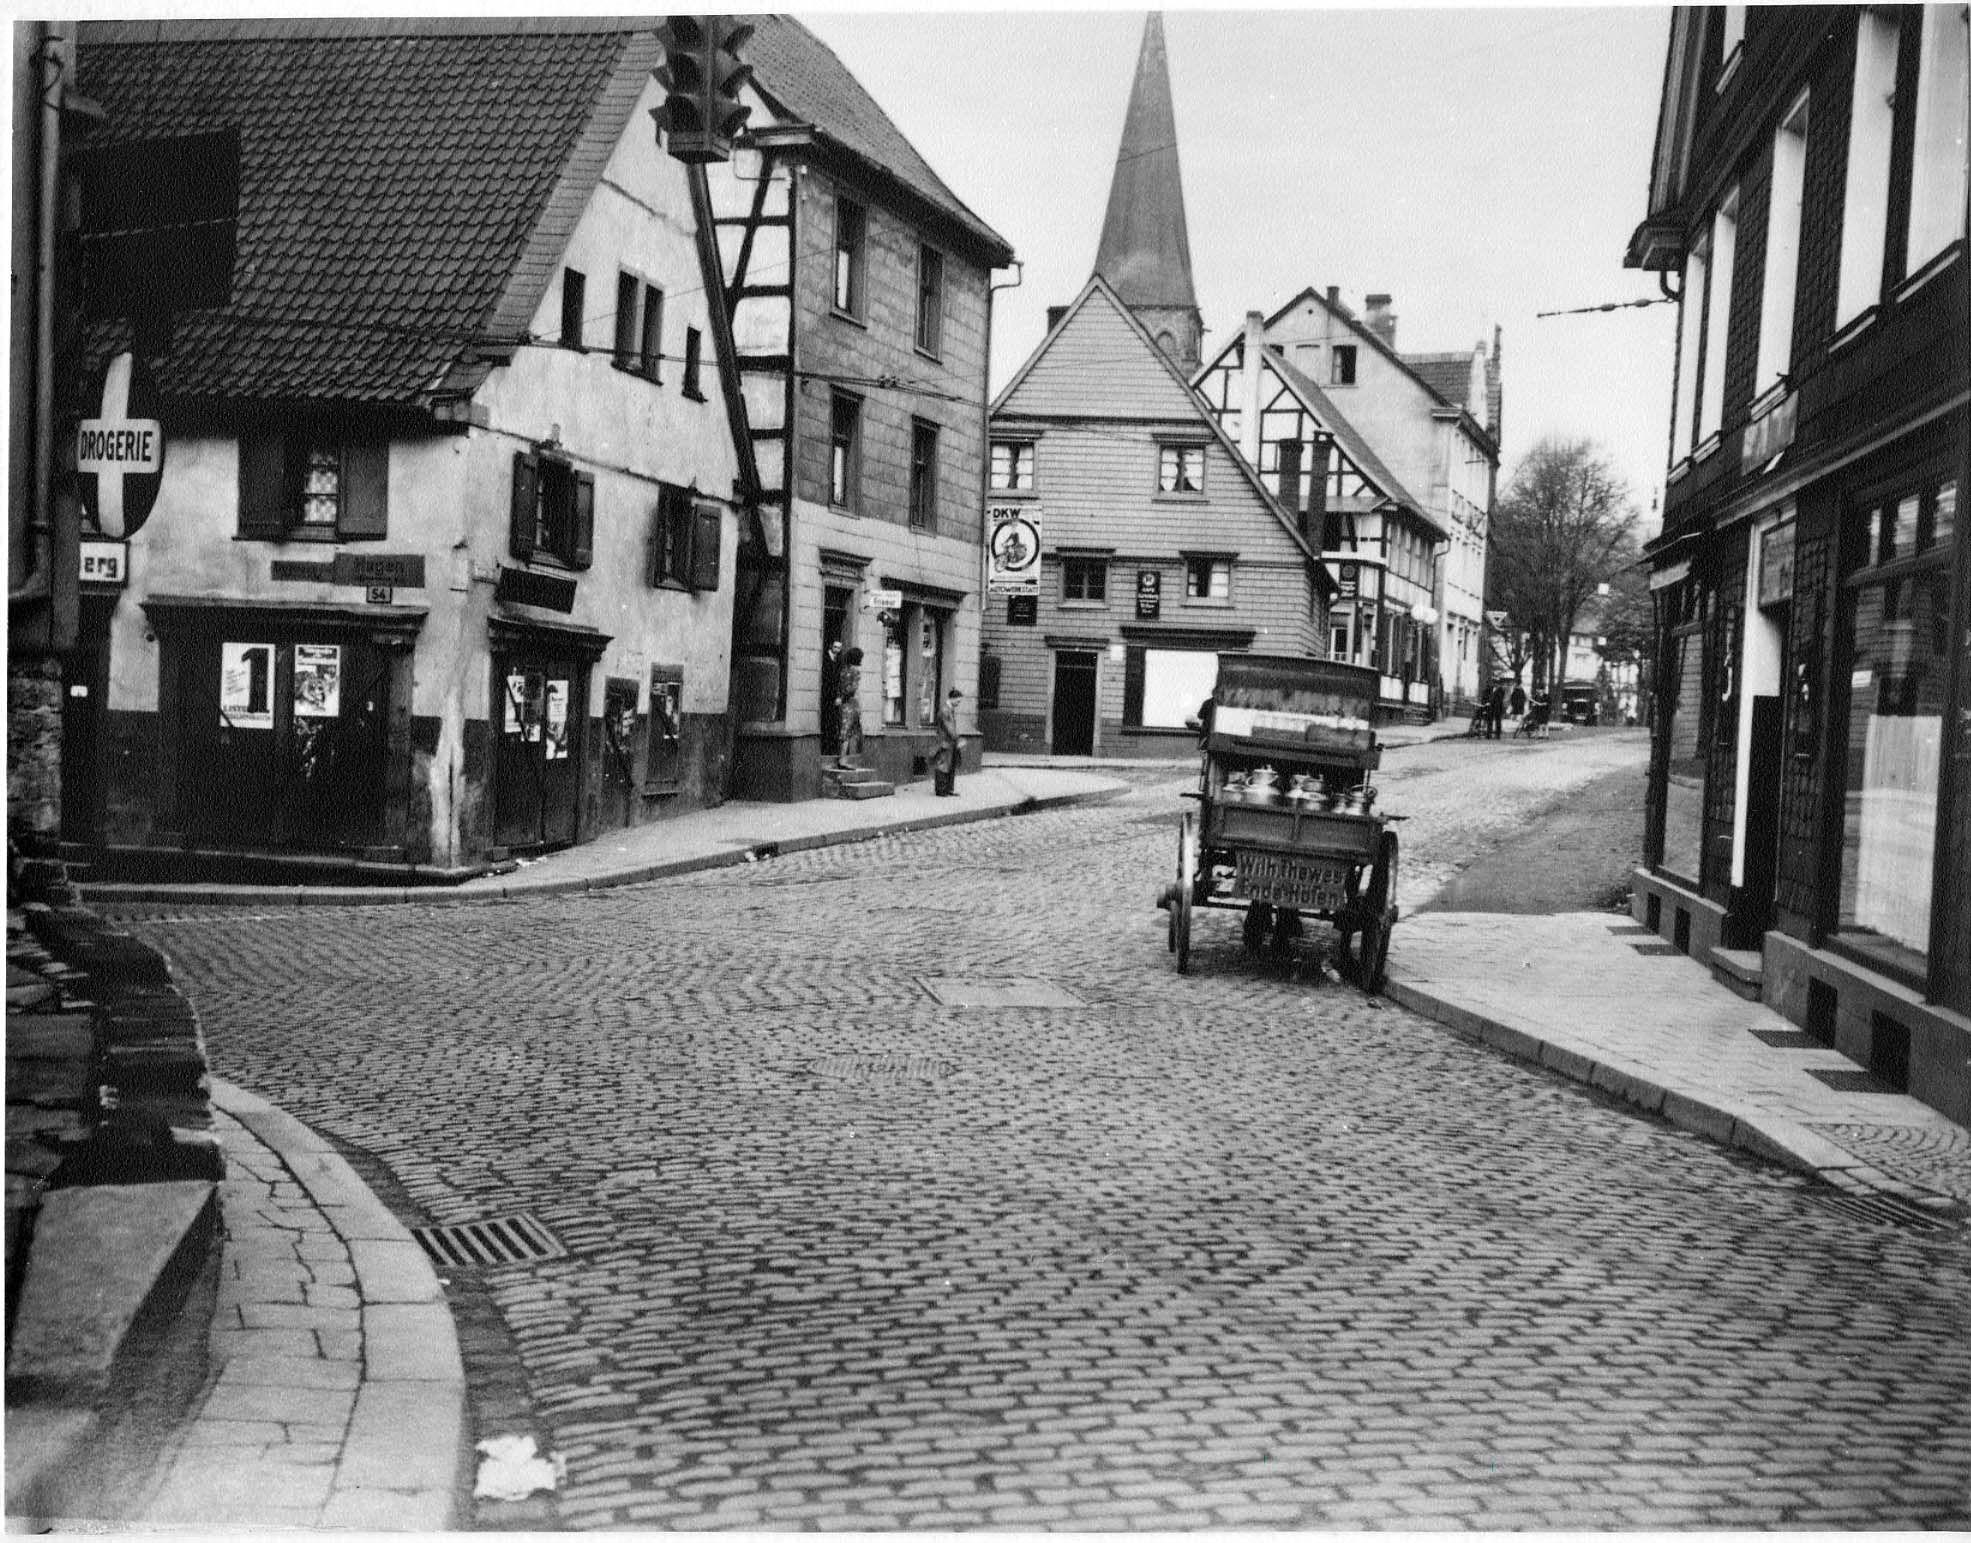 Hauptstraße, Ecke Wetterstraße, Herdecke, Westfalen, 30er